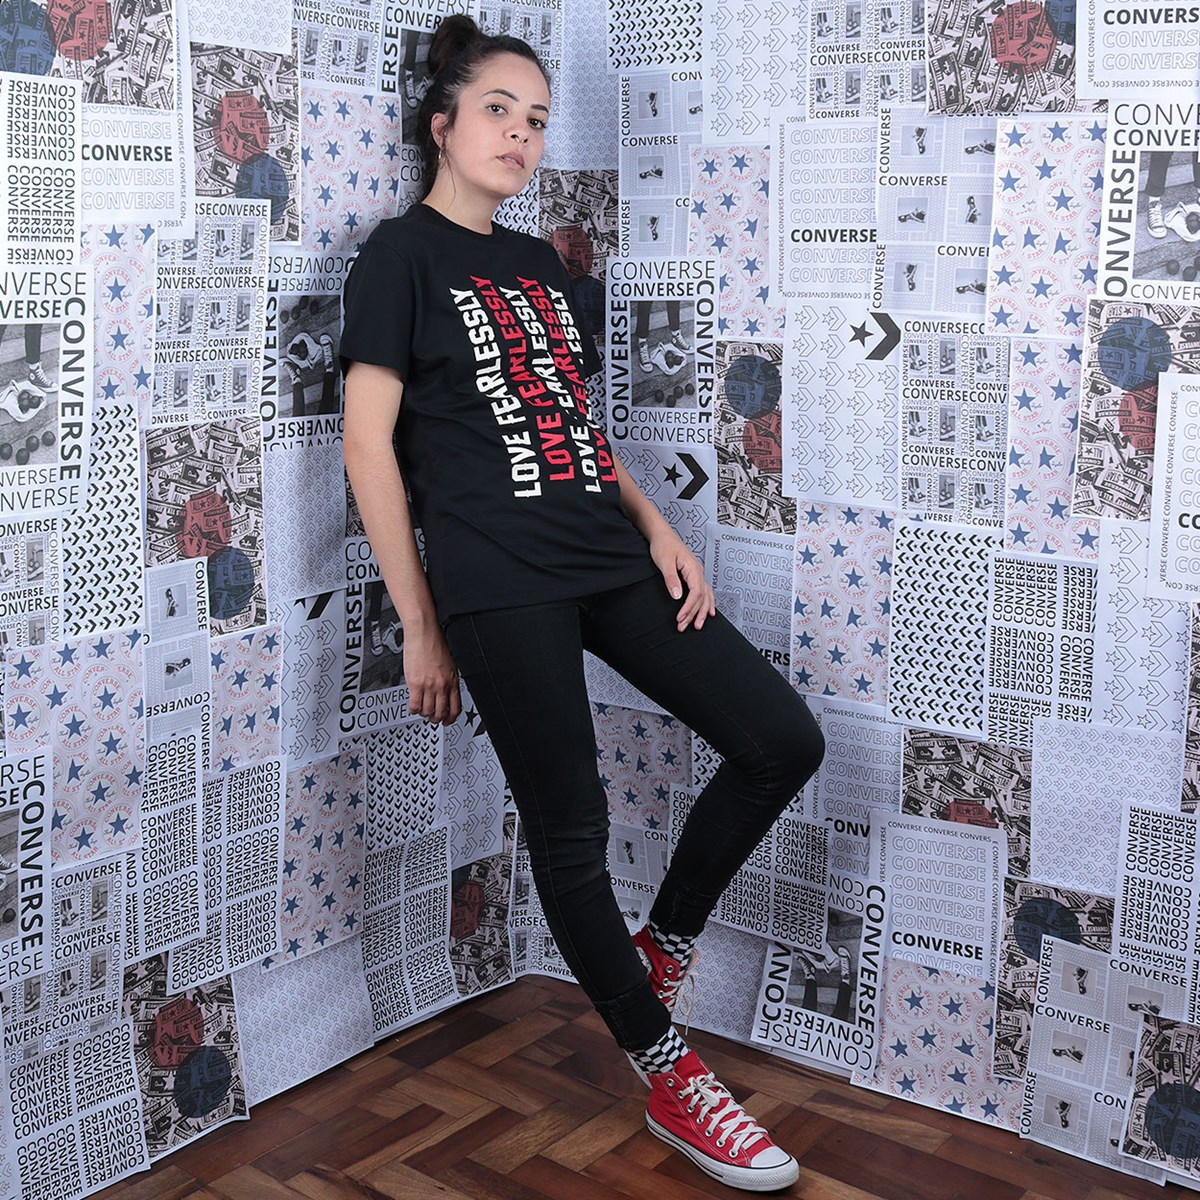 Camiseta Converse Love The Progress 2.0 Relaxed Tee Black 10019658-A01